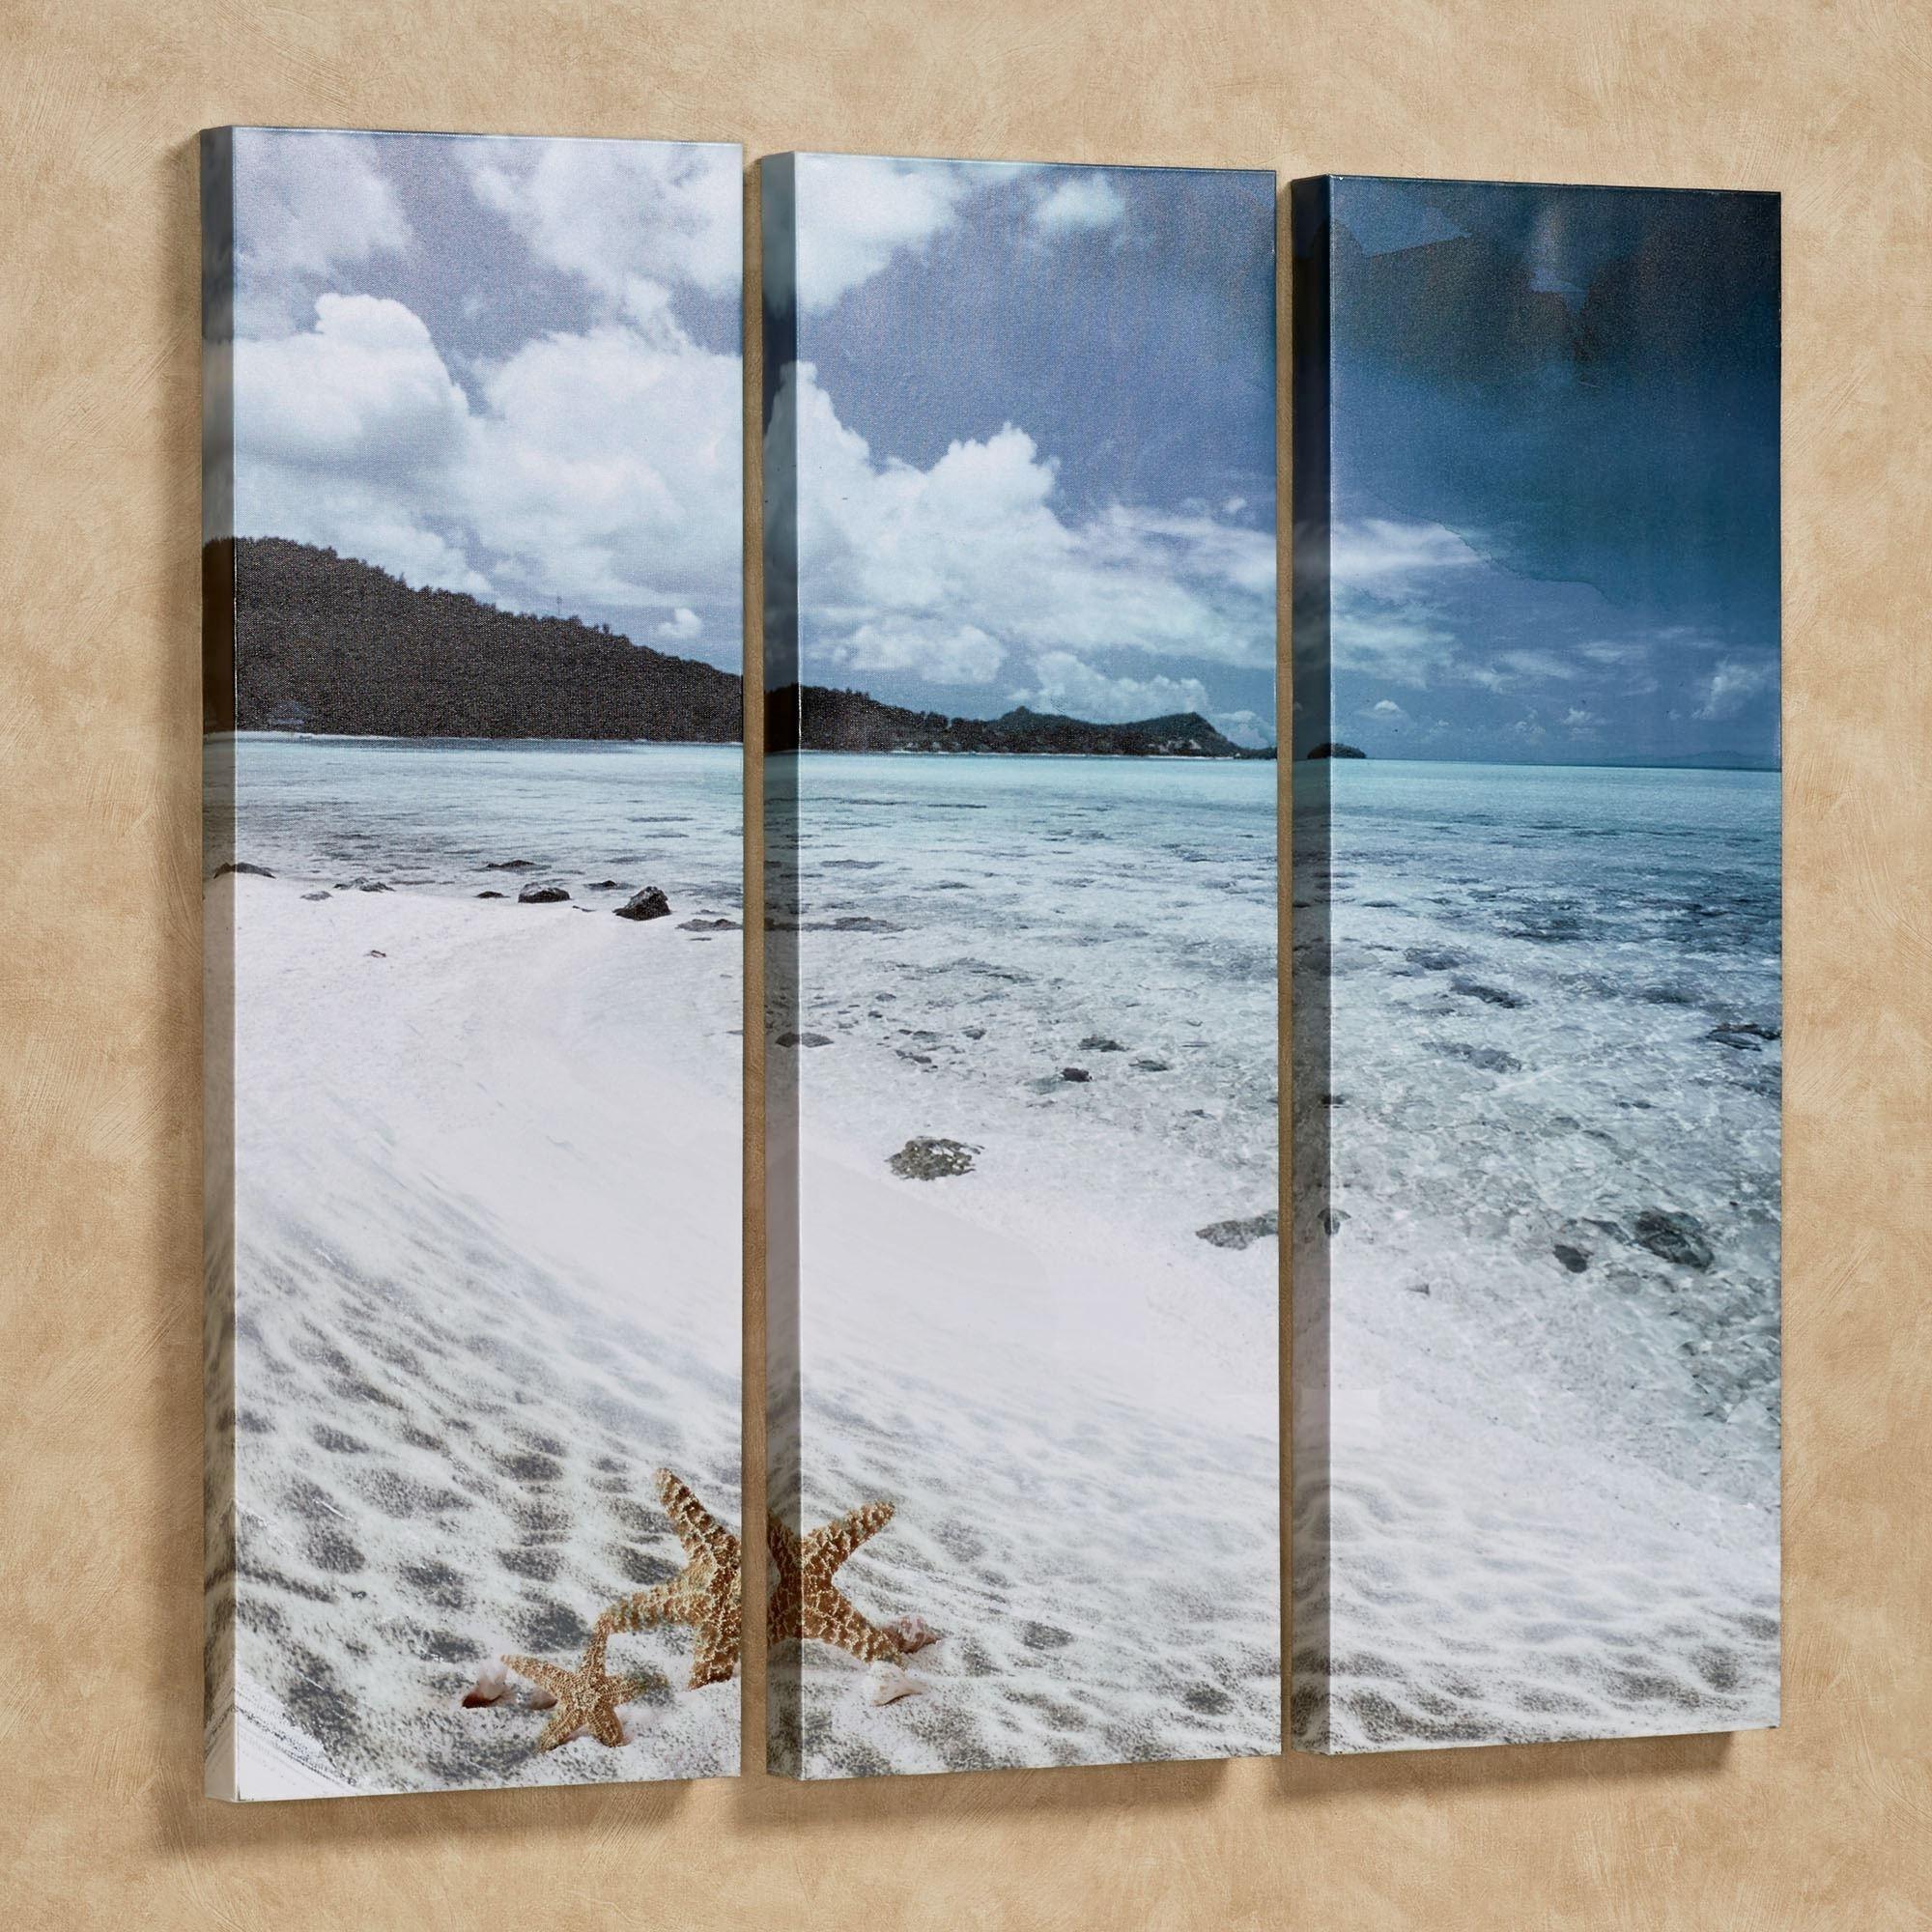 Fashionable Triptych Wall Art in Paradise Beach Triptych Canvas Wall Art Set